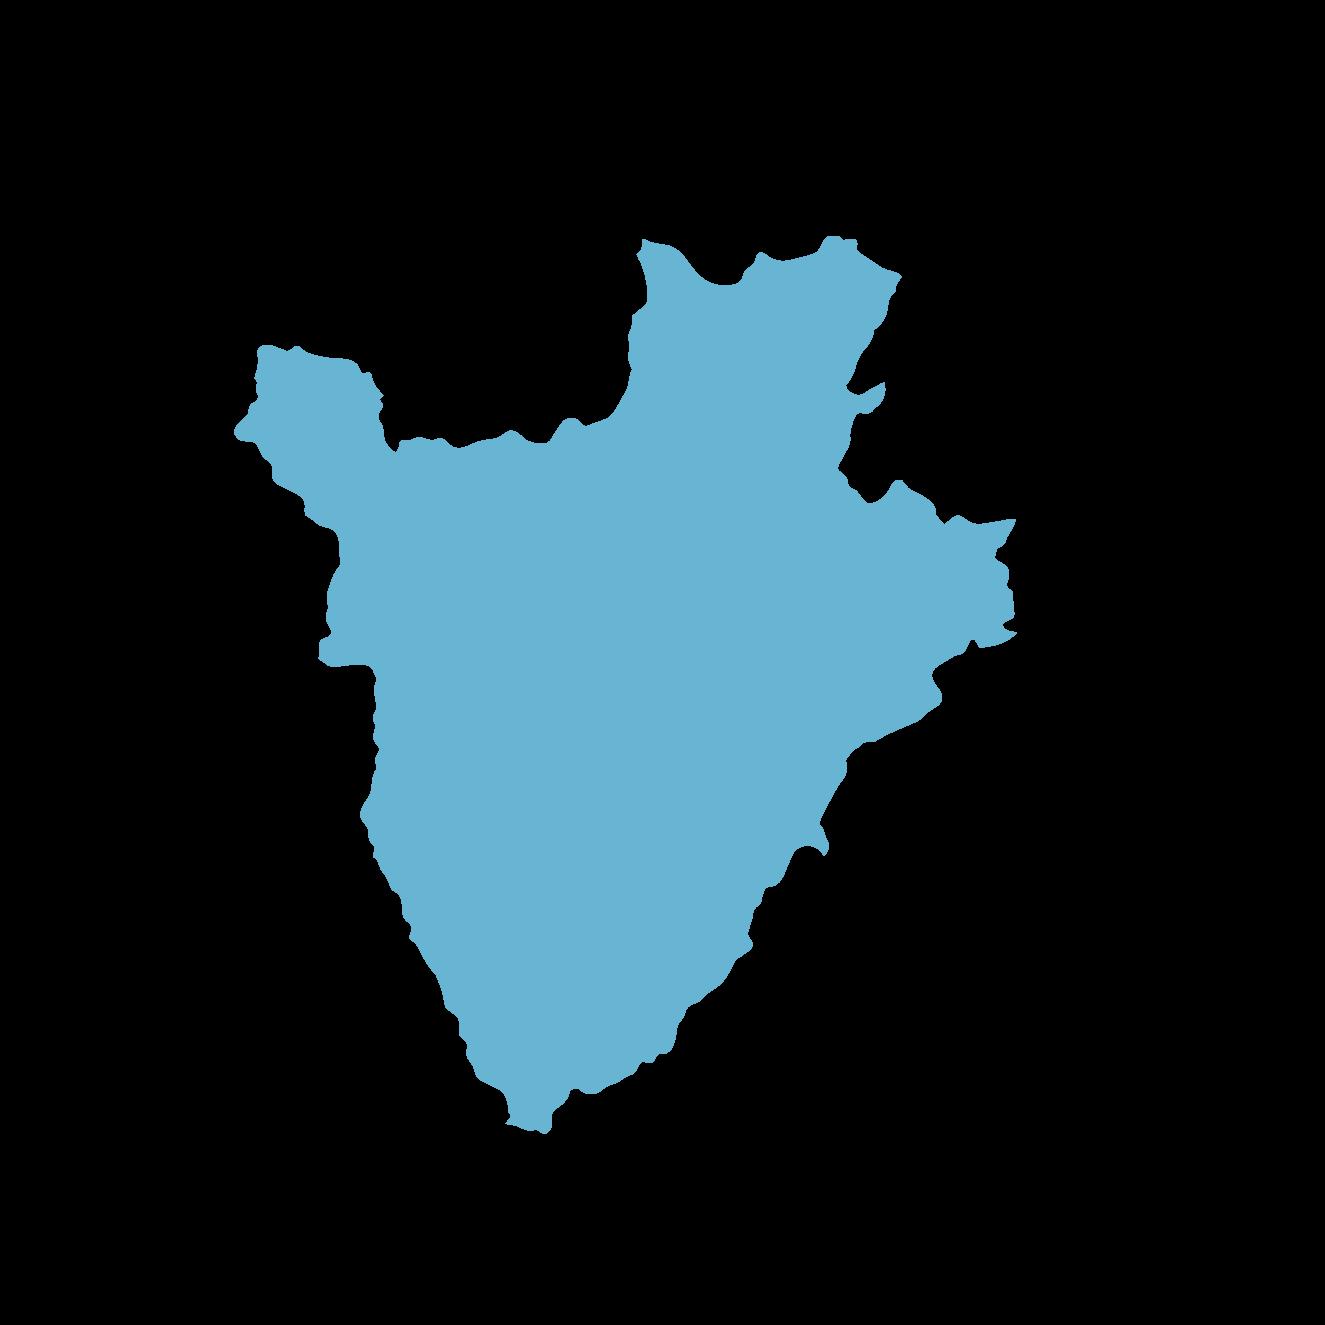 Icon illustration of Burundi